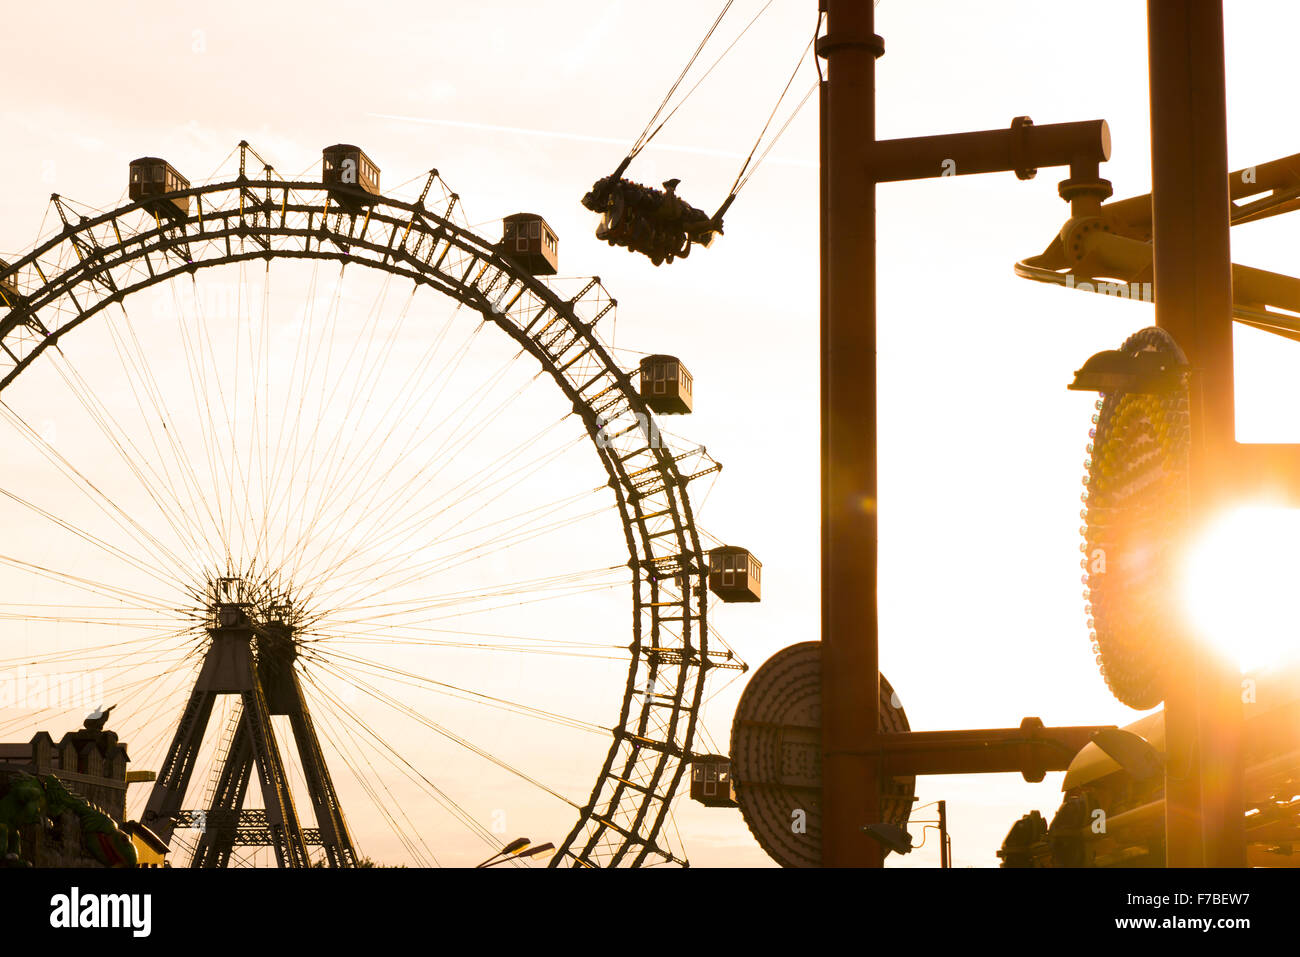 Prater, Riesenrad, Giant Ferry Wheel, Vienna, Austria, 2. district - Stock Image